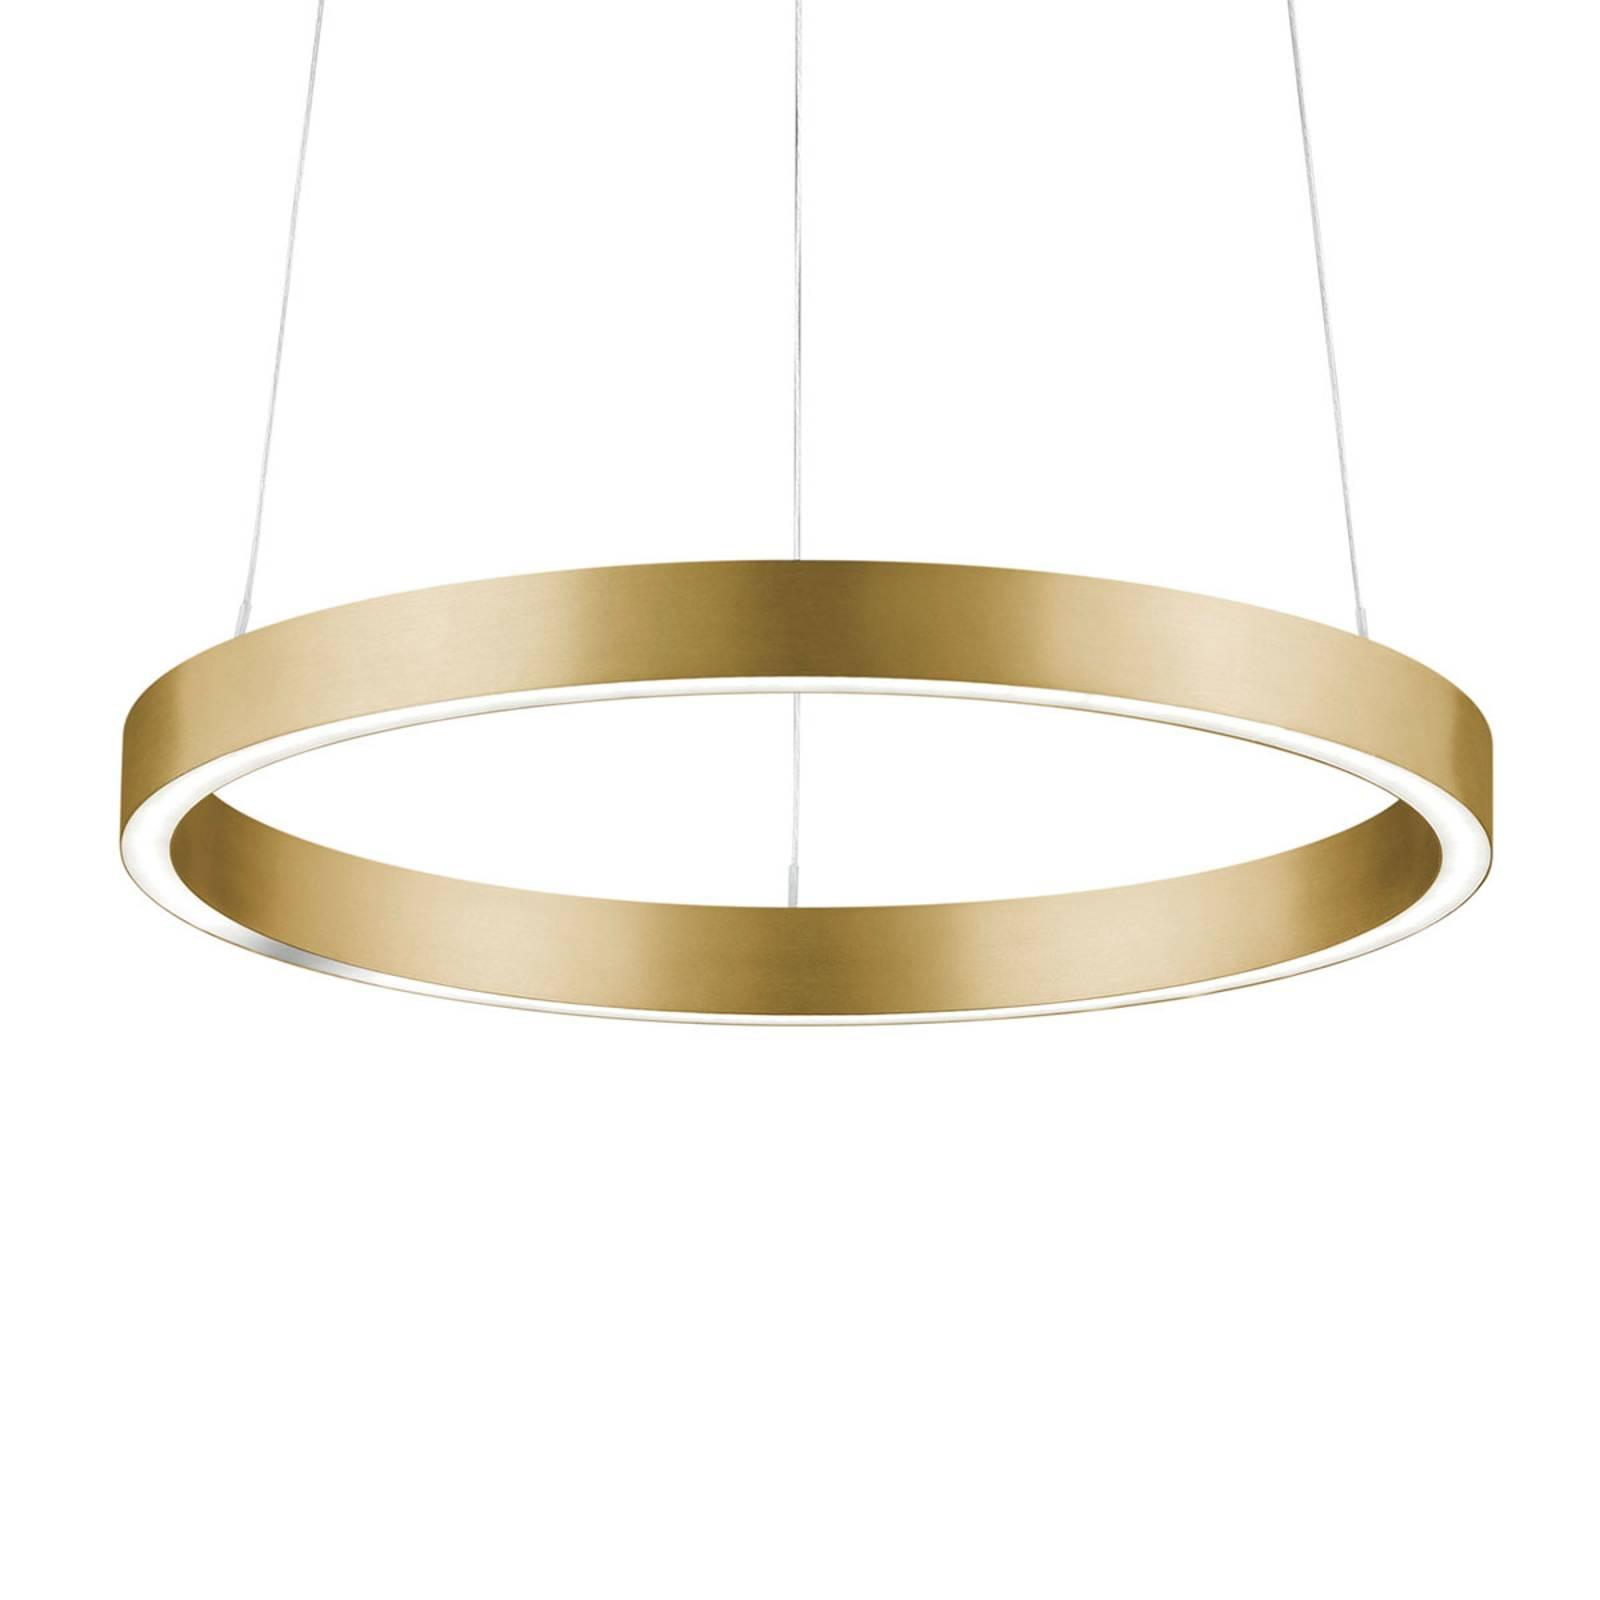 LED-riippuvalaisin Svea-40 eleohjauksella, kulta